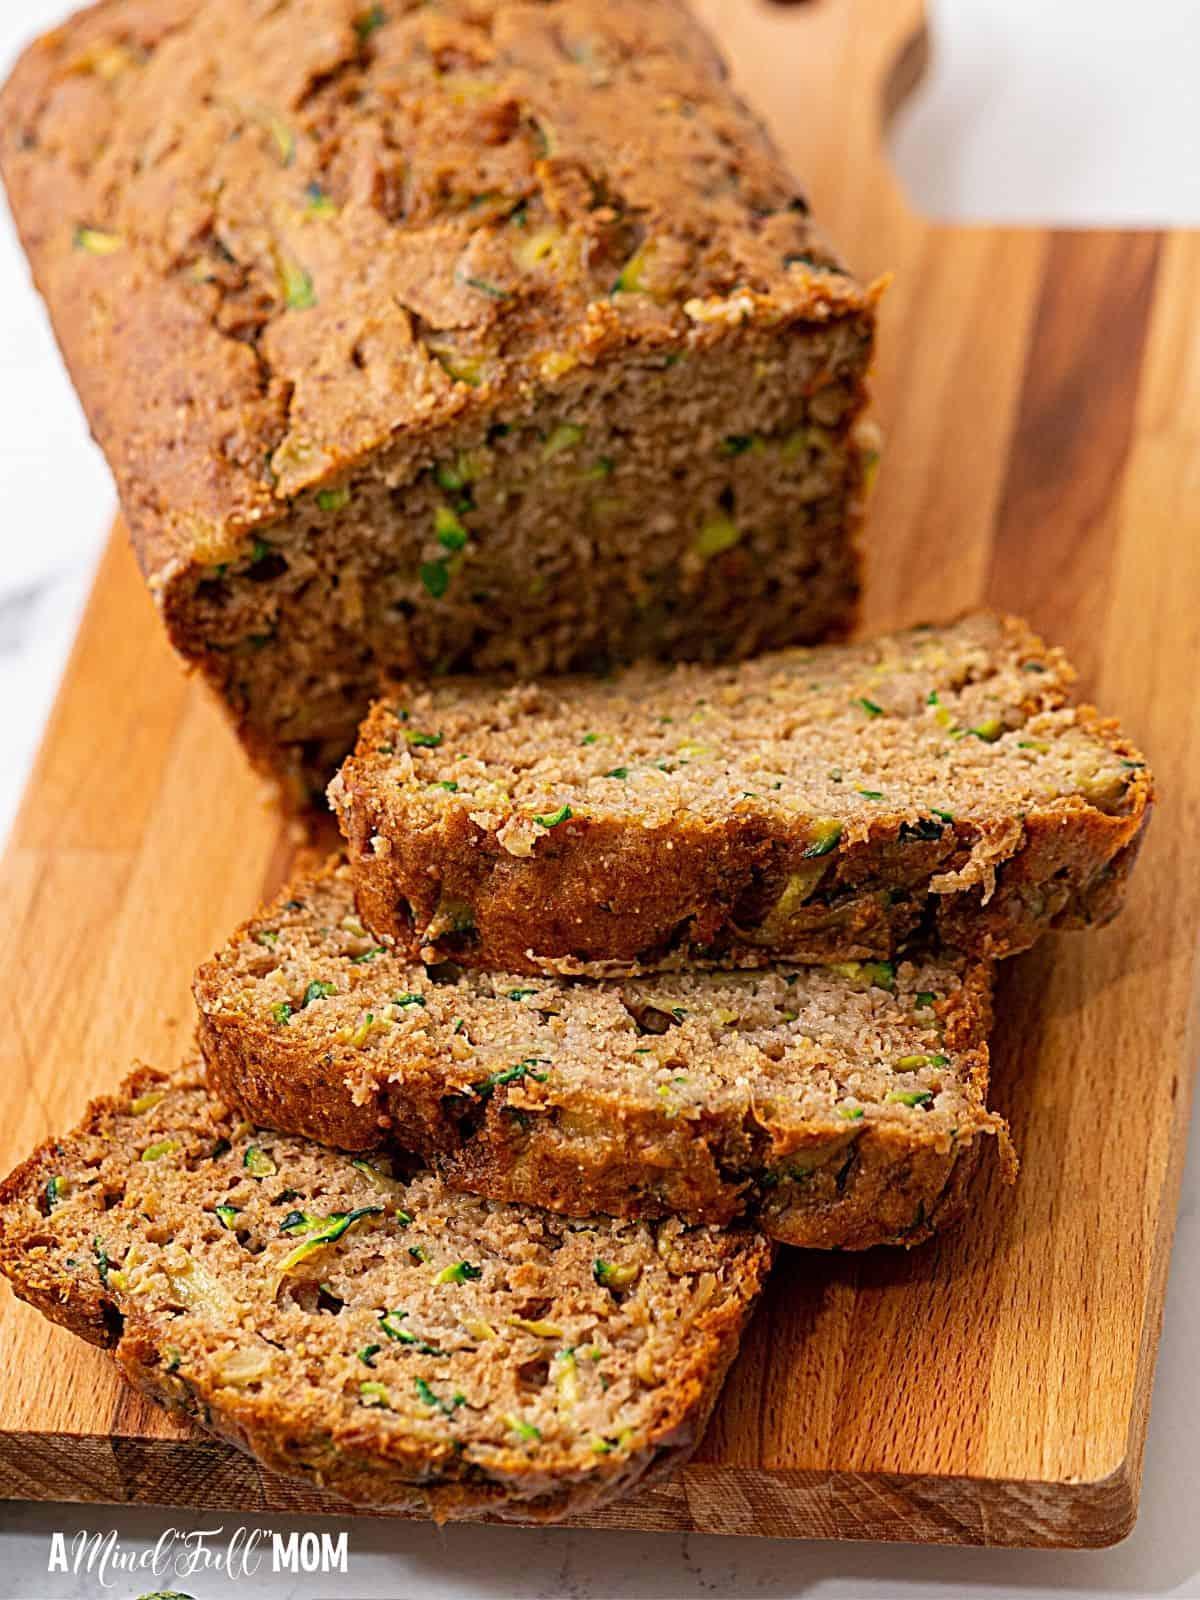 Sliced zucchini bread on wooden cutting board.